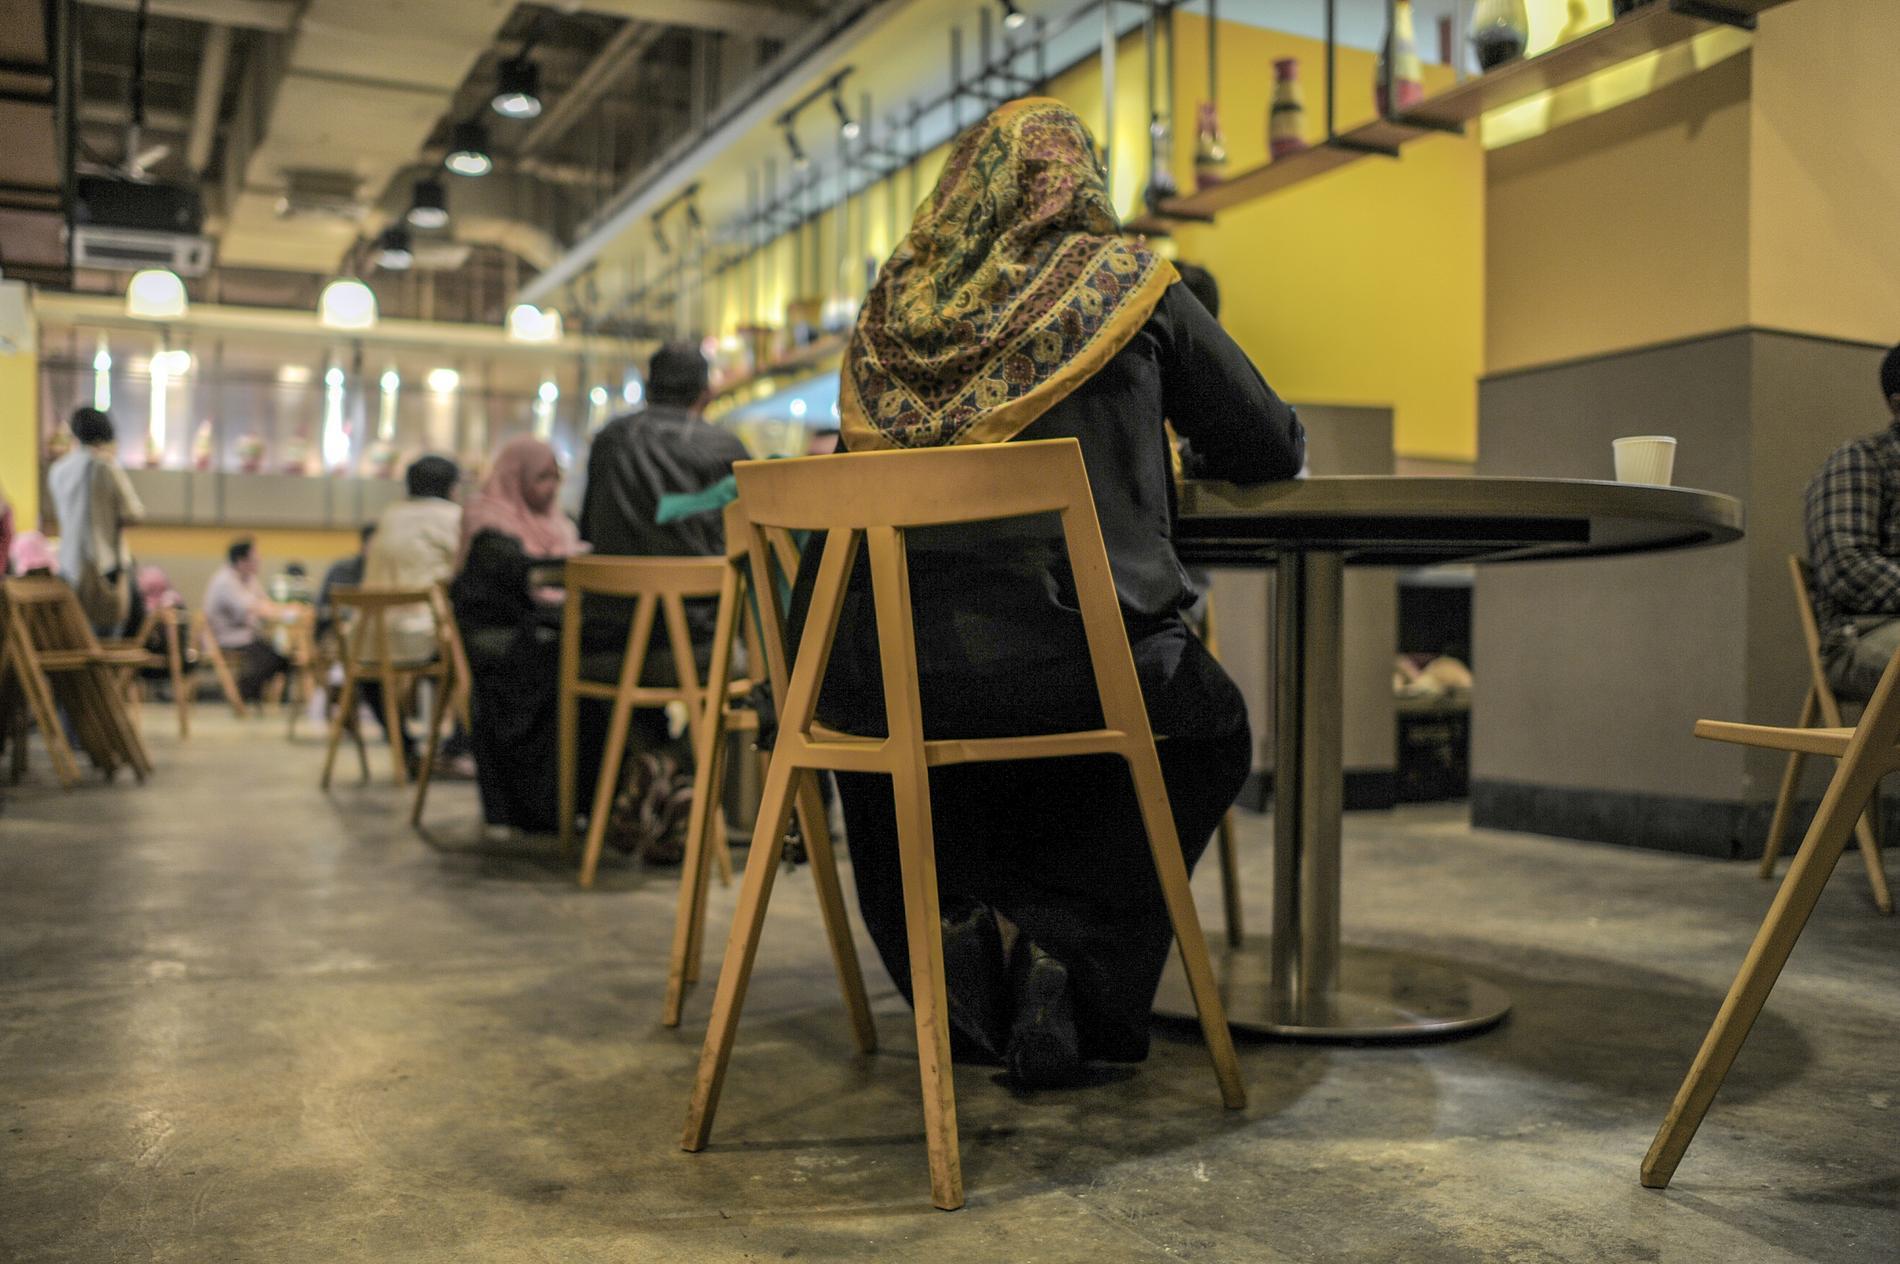 rencontre musulmane pour mariage halal